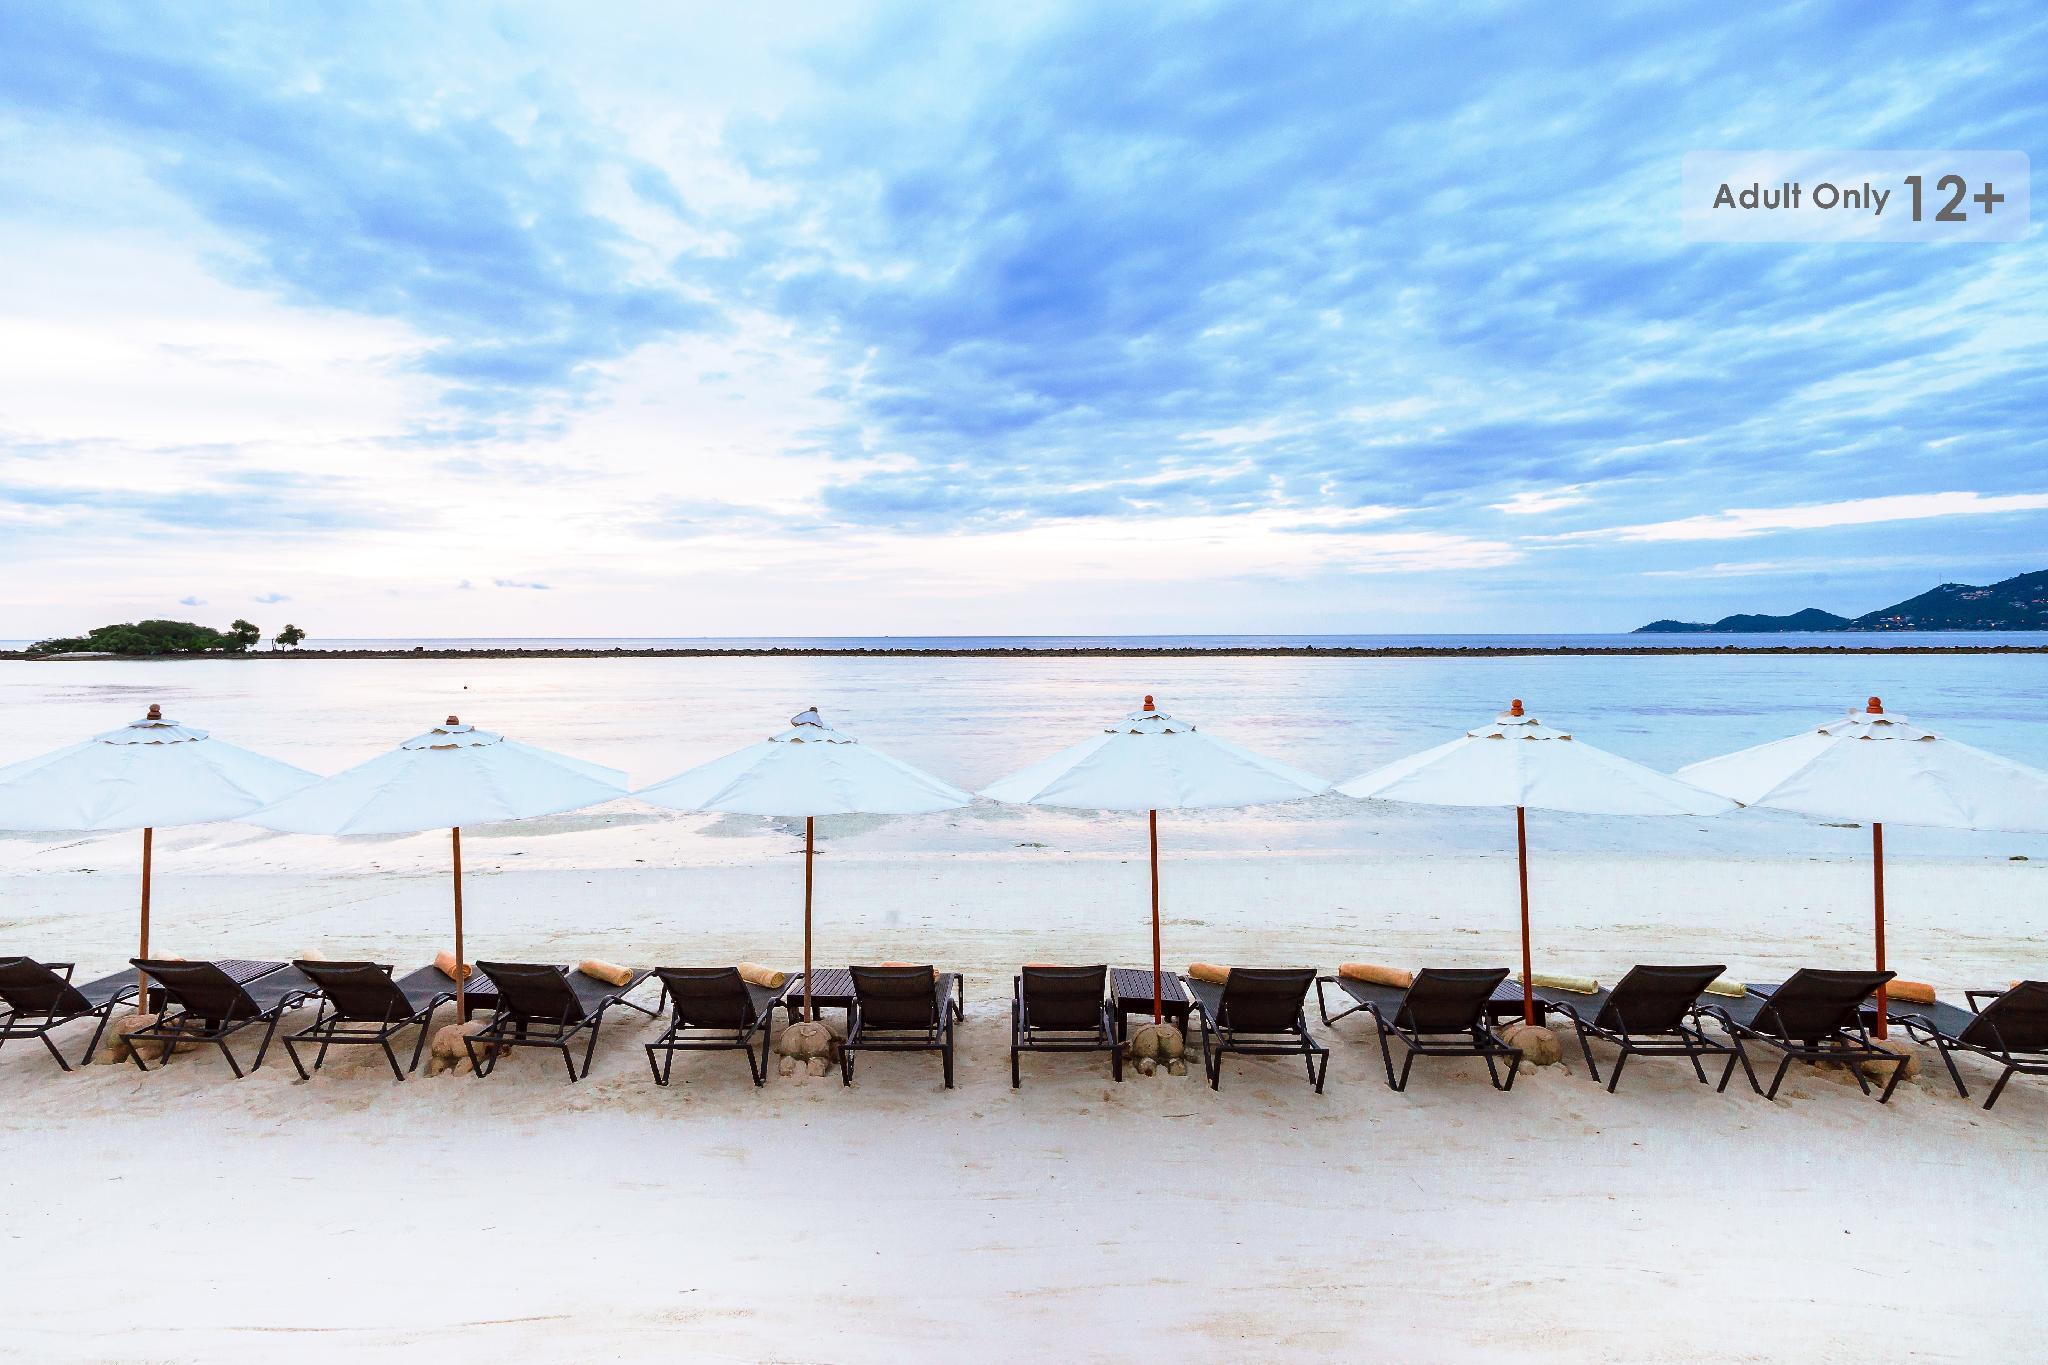 Dara Samui Beach Resort & Villa - Adults Only ดารา สมุย บีช รีสอร์ต แอนด์ วิลลา - สำหรับผู้ใหญ่เท่านั้น